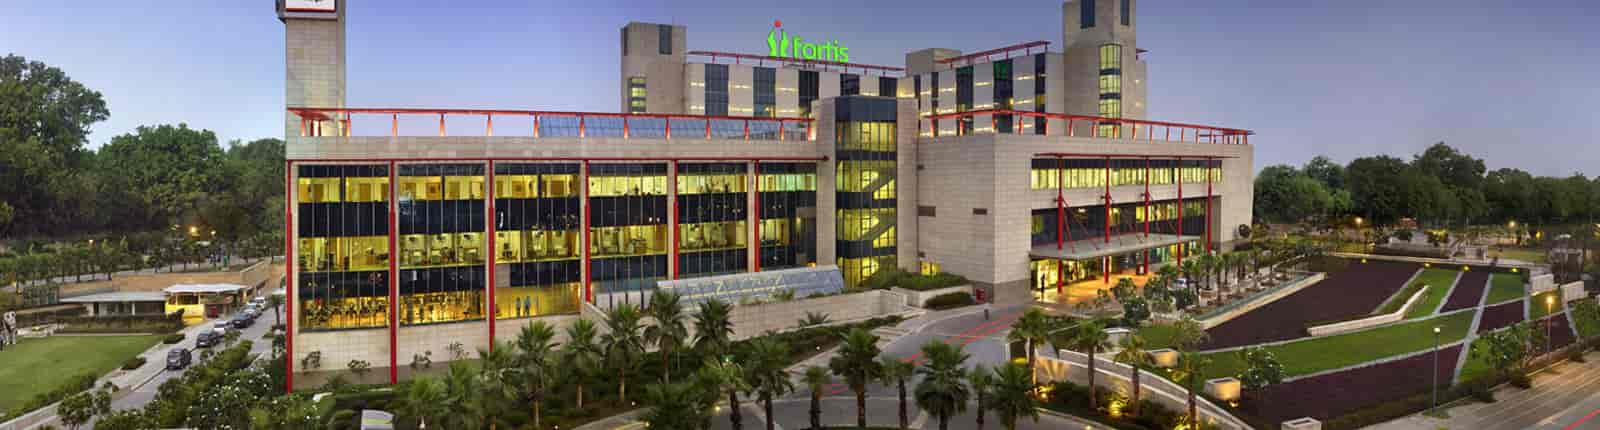 Fortis Memorial Research Institute FMRI ,Gurgaon | Best Hospitals in India